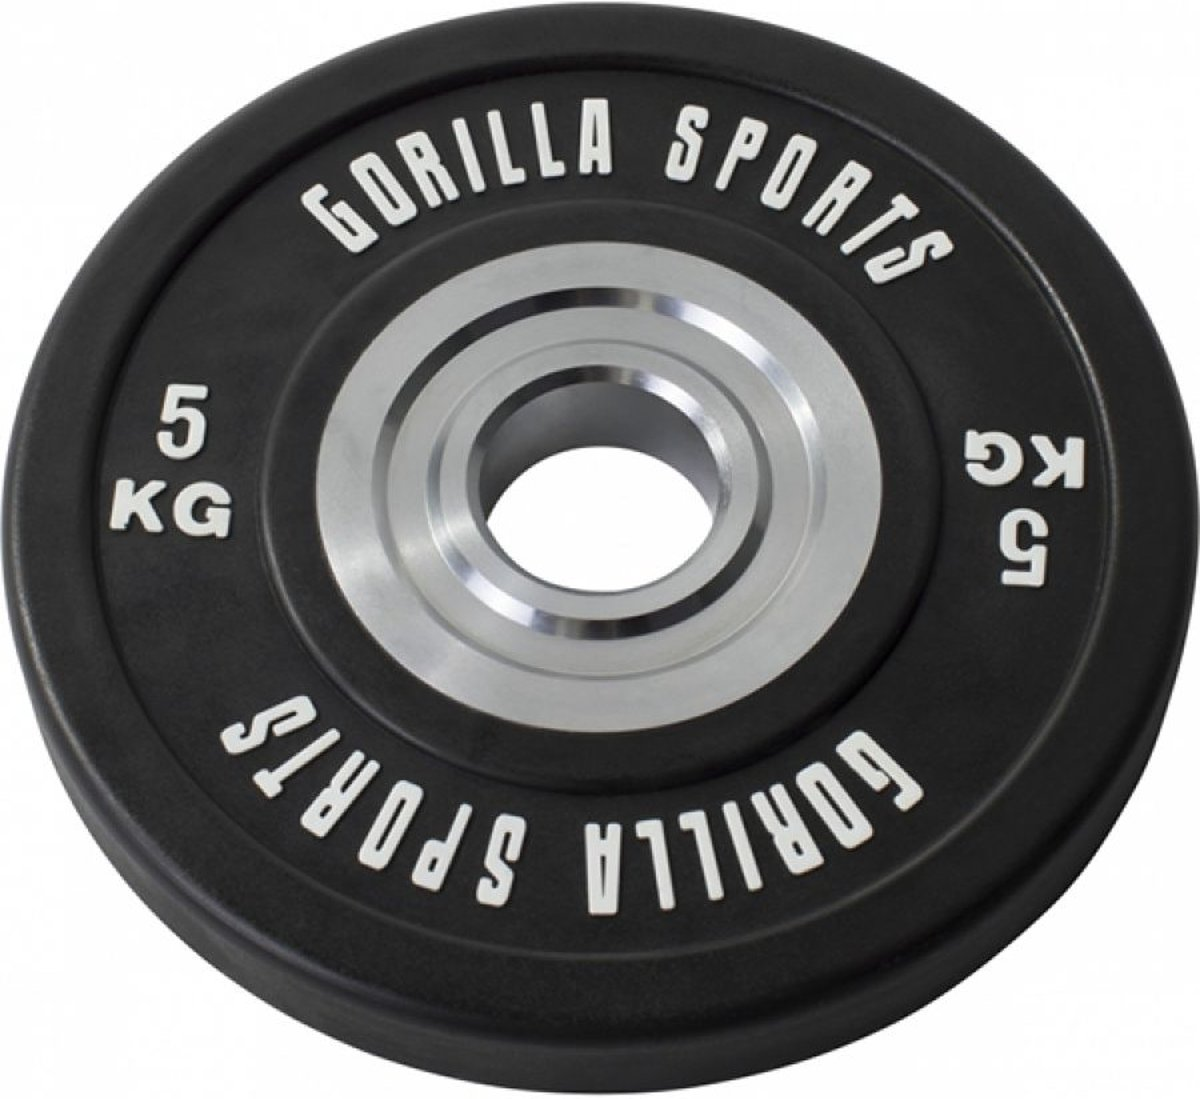 Gorilla Sports Bumper Plate 5 kg Gietijzer met rubber coating kopen